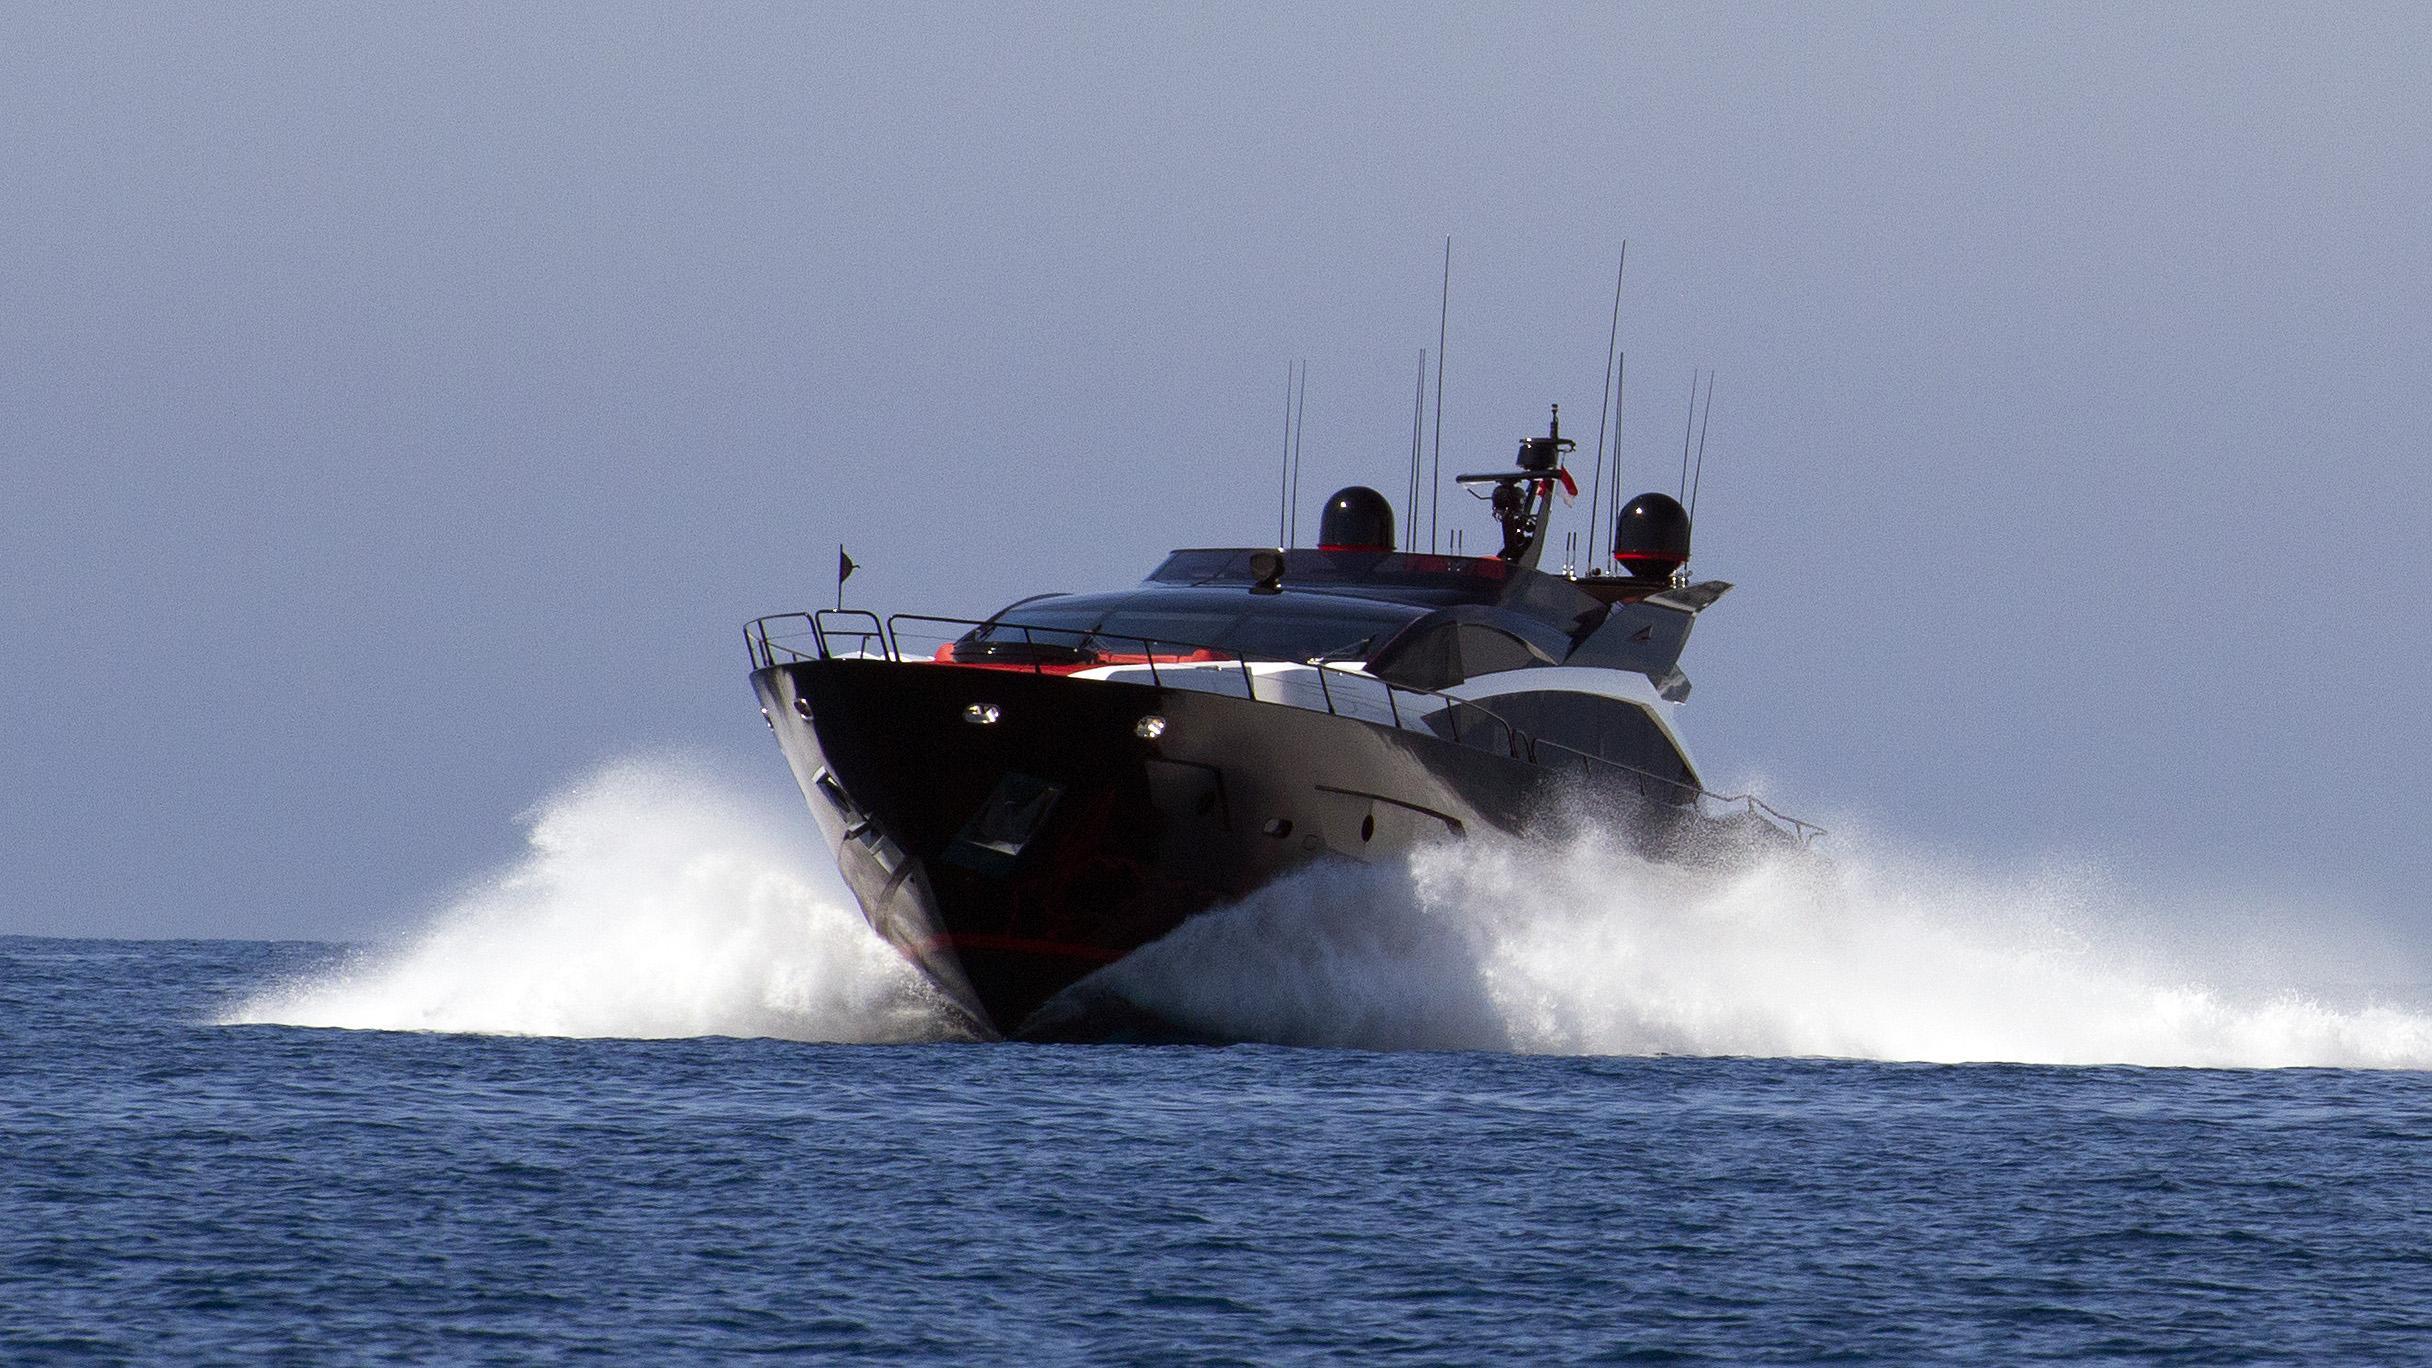 black-legend-motor-yacht-sunseeker-101-sy-2013-30m-running-bow